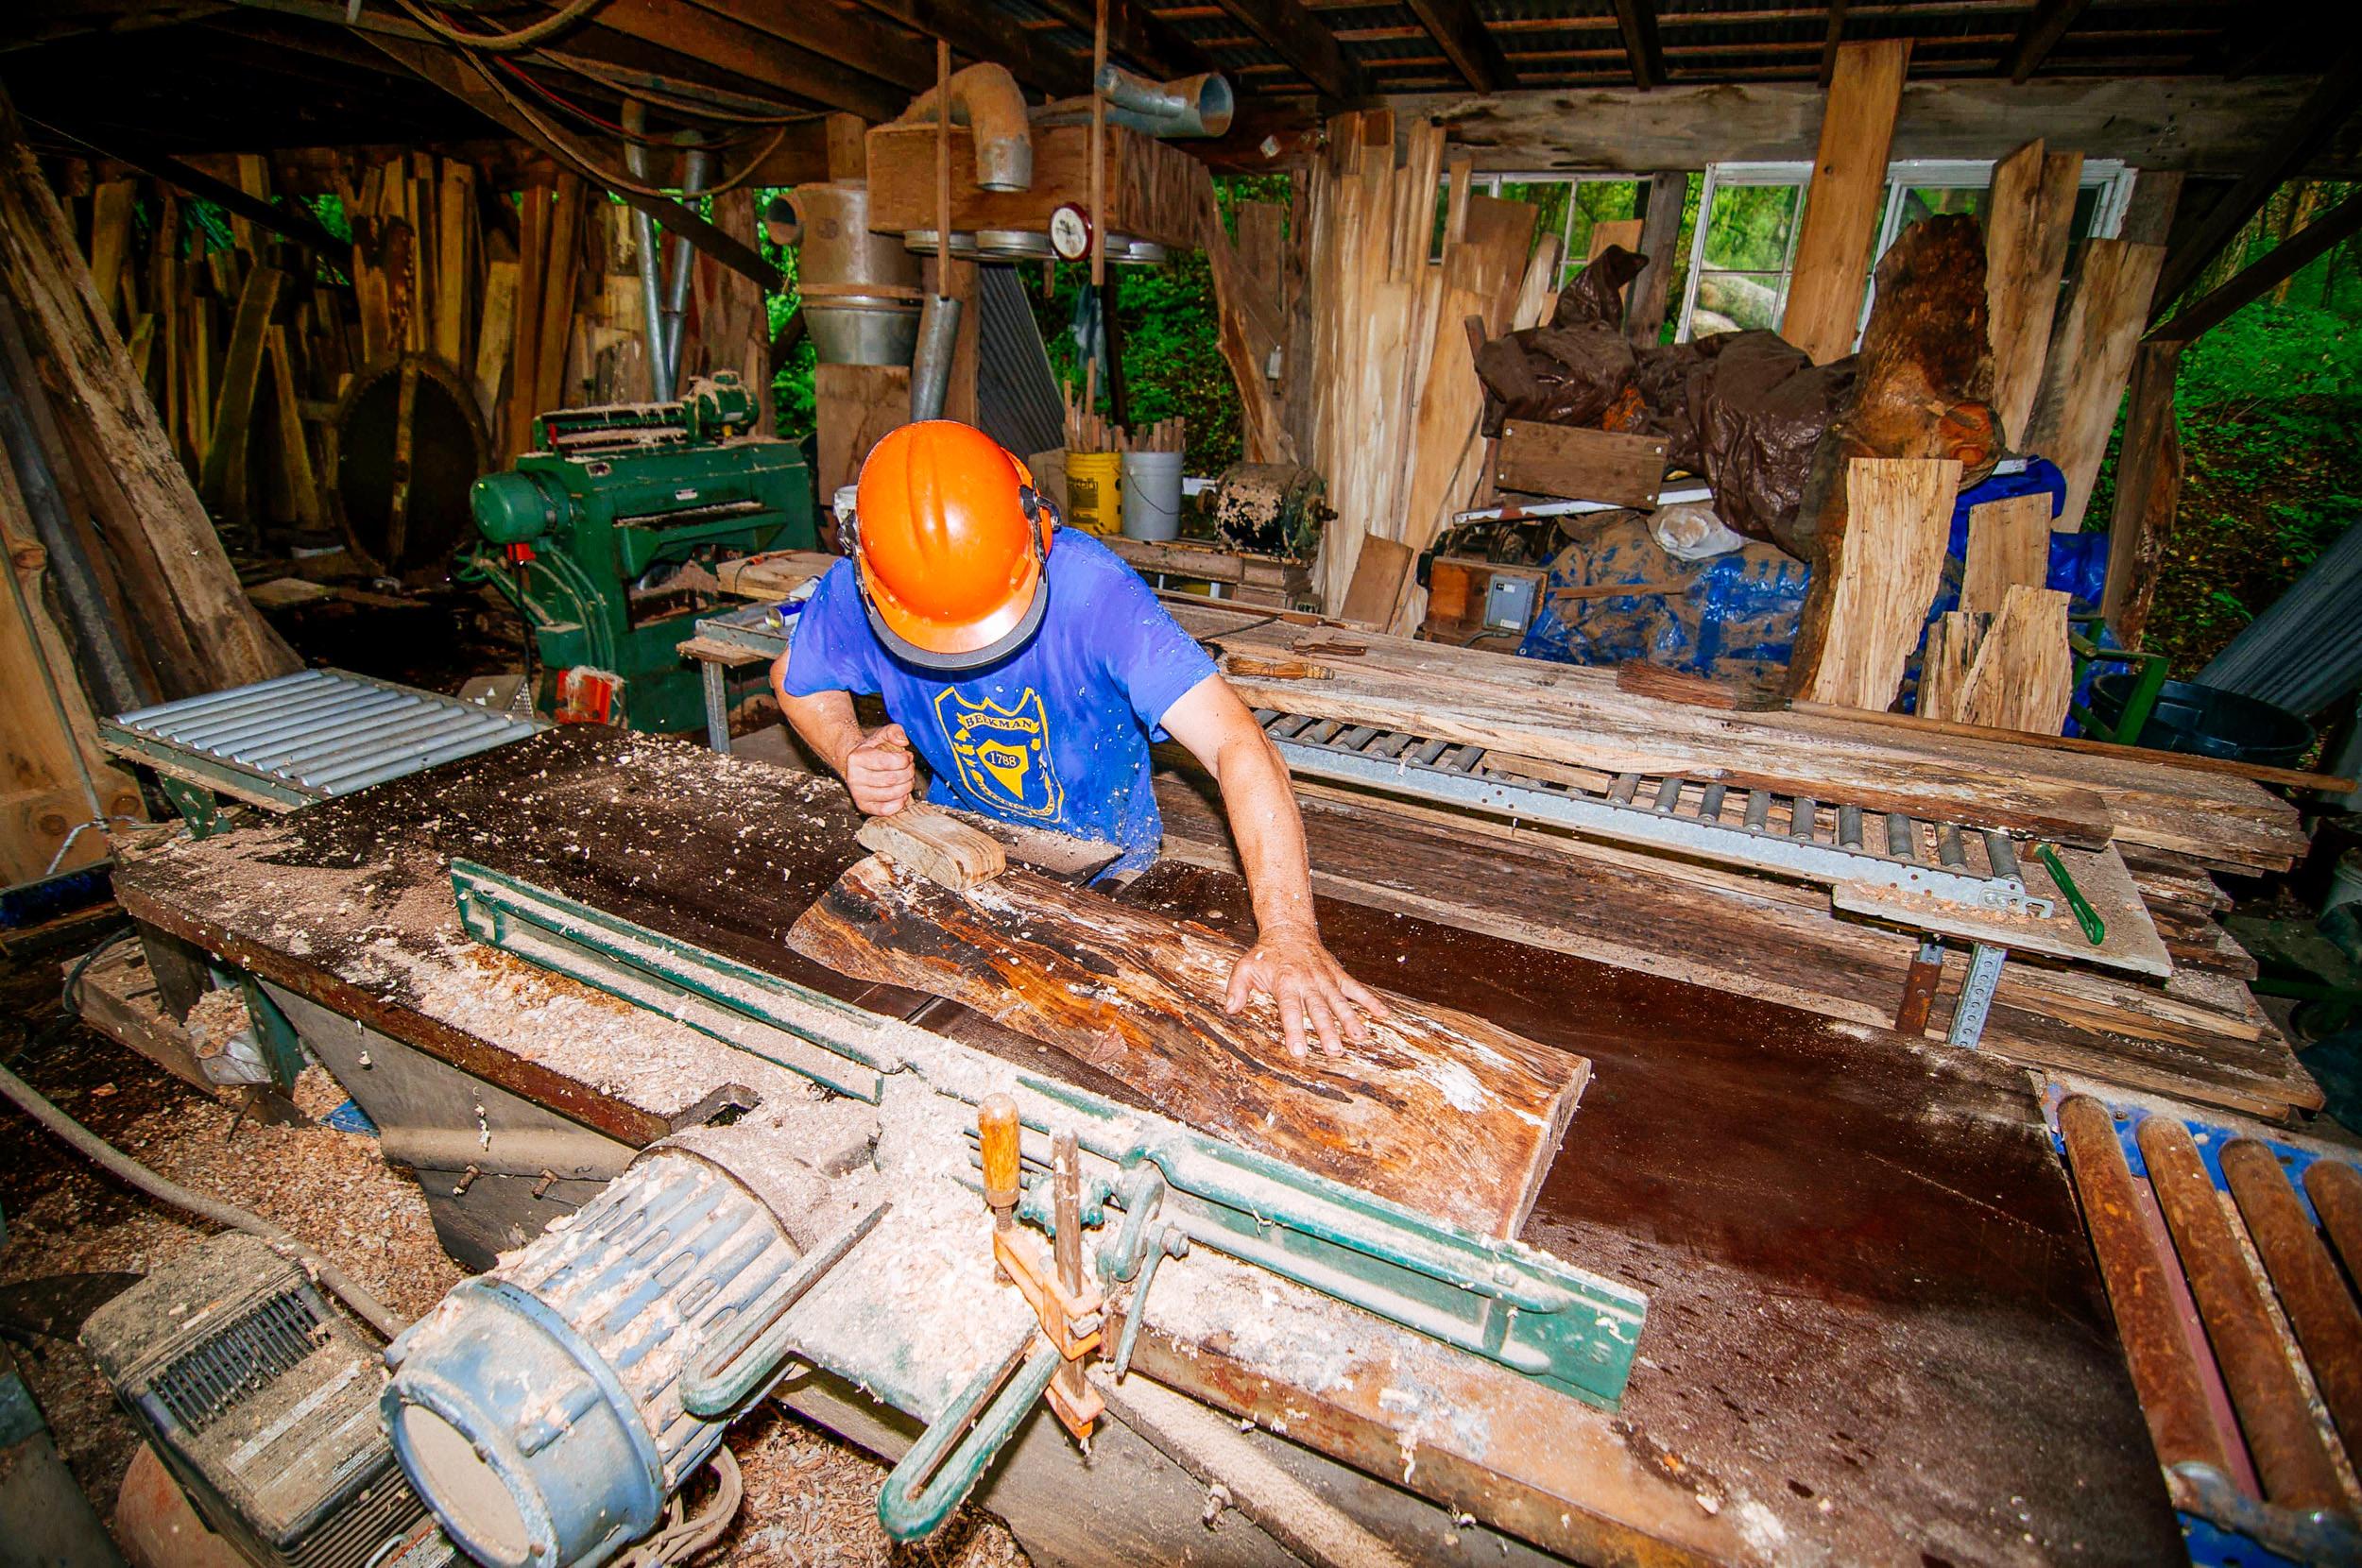 Porter Wood Working Tools John Walker Sawmill Hopewell Junction NY-102.jpg